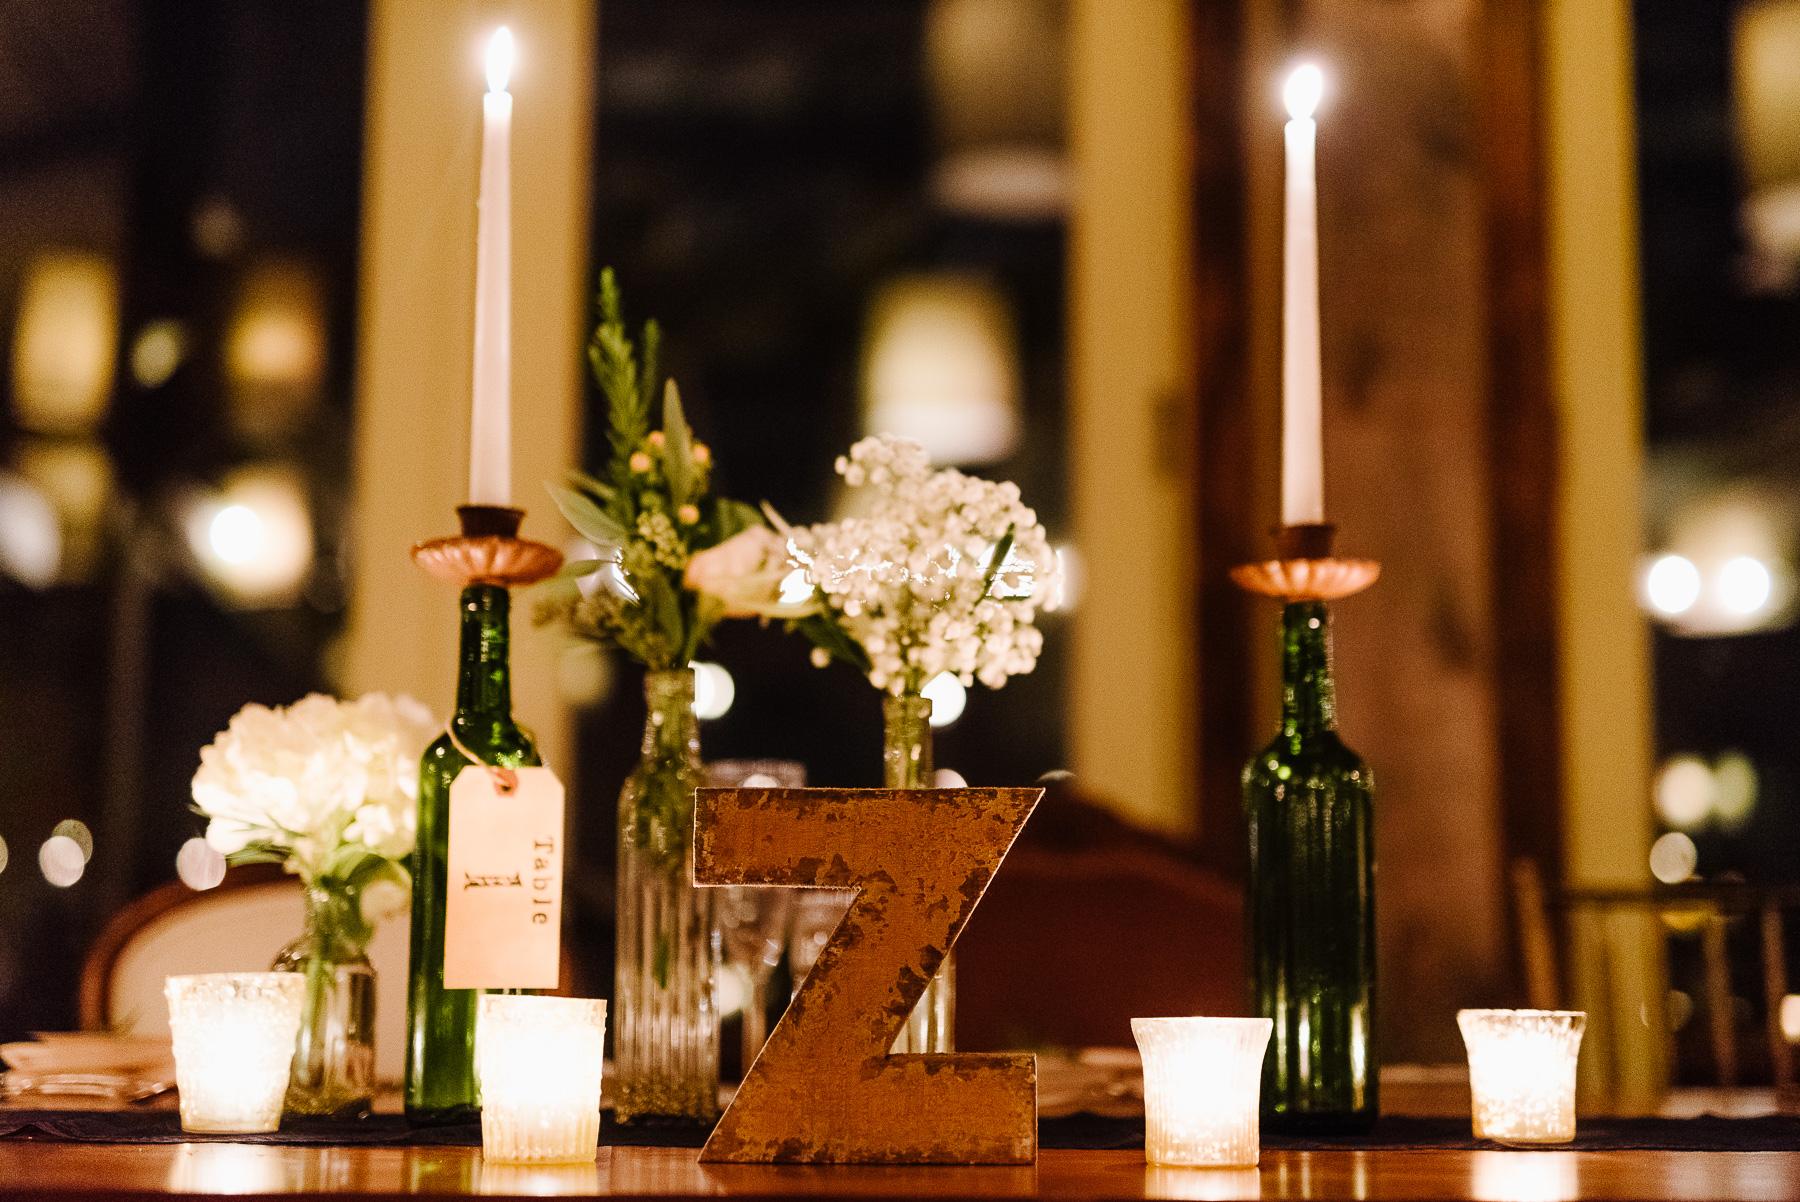 98-Laurita Winery Wedding New Jersey Wedding Photographer Laurita Winery Weddings Longbrook Photography.jpg